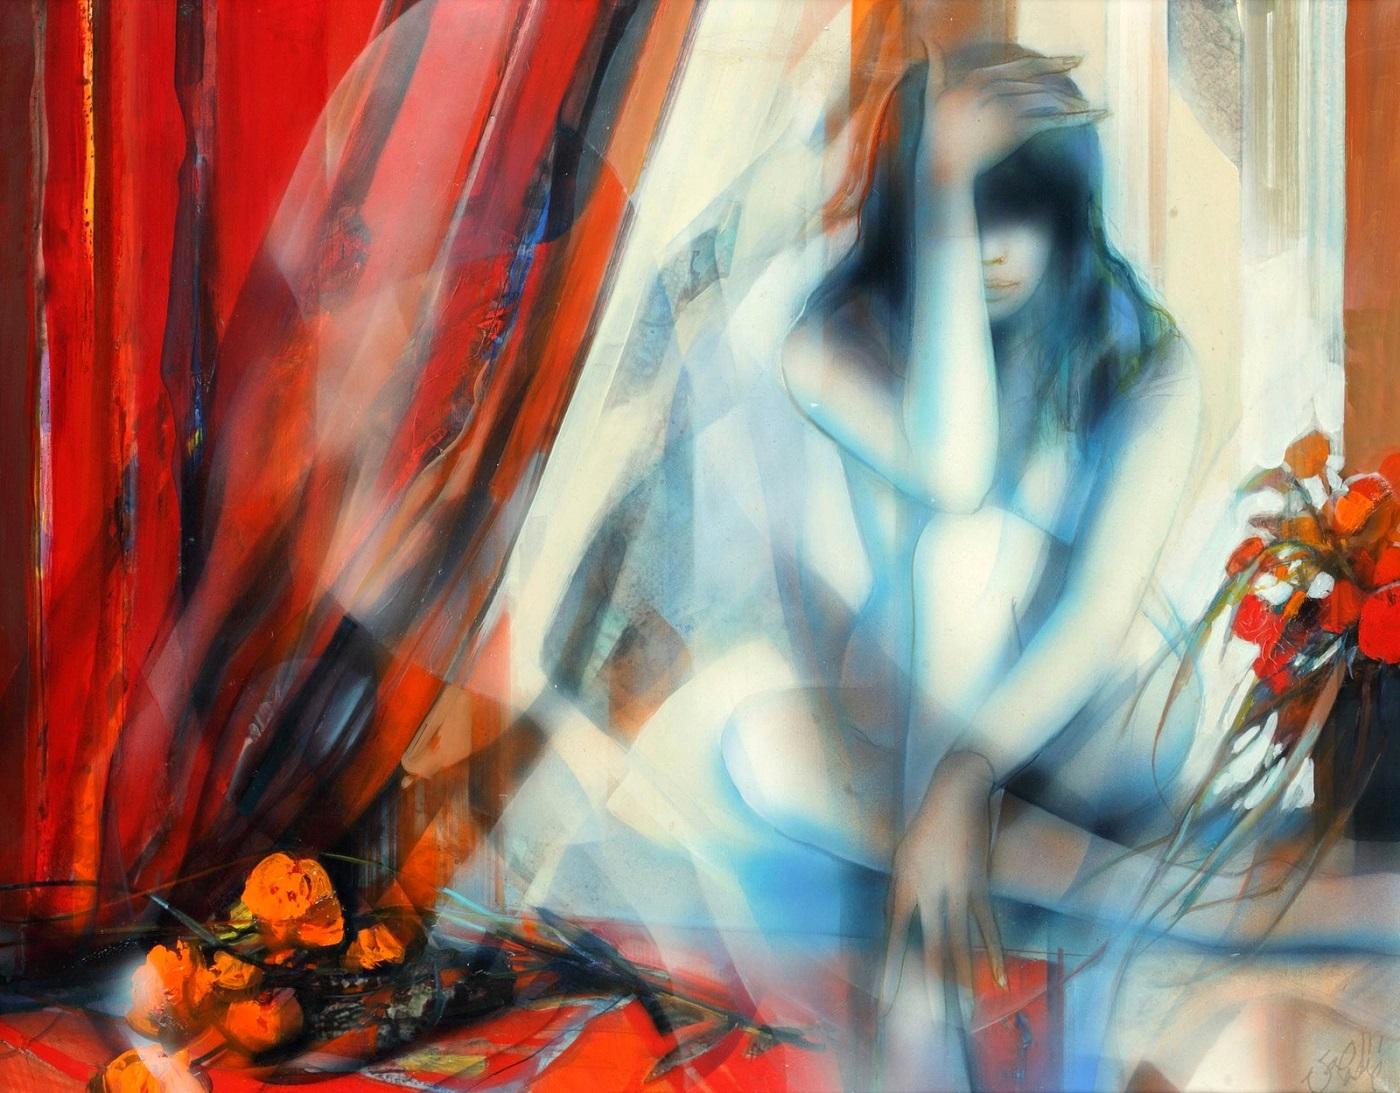 Красный занавес (Rideau rouge)_73 х 92_х.,м._Частное собрание.jpg